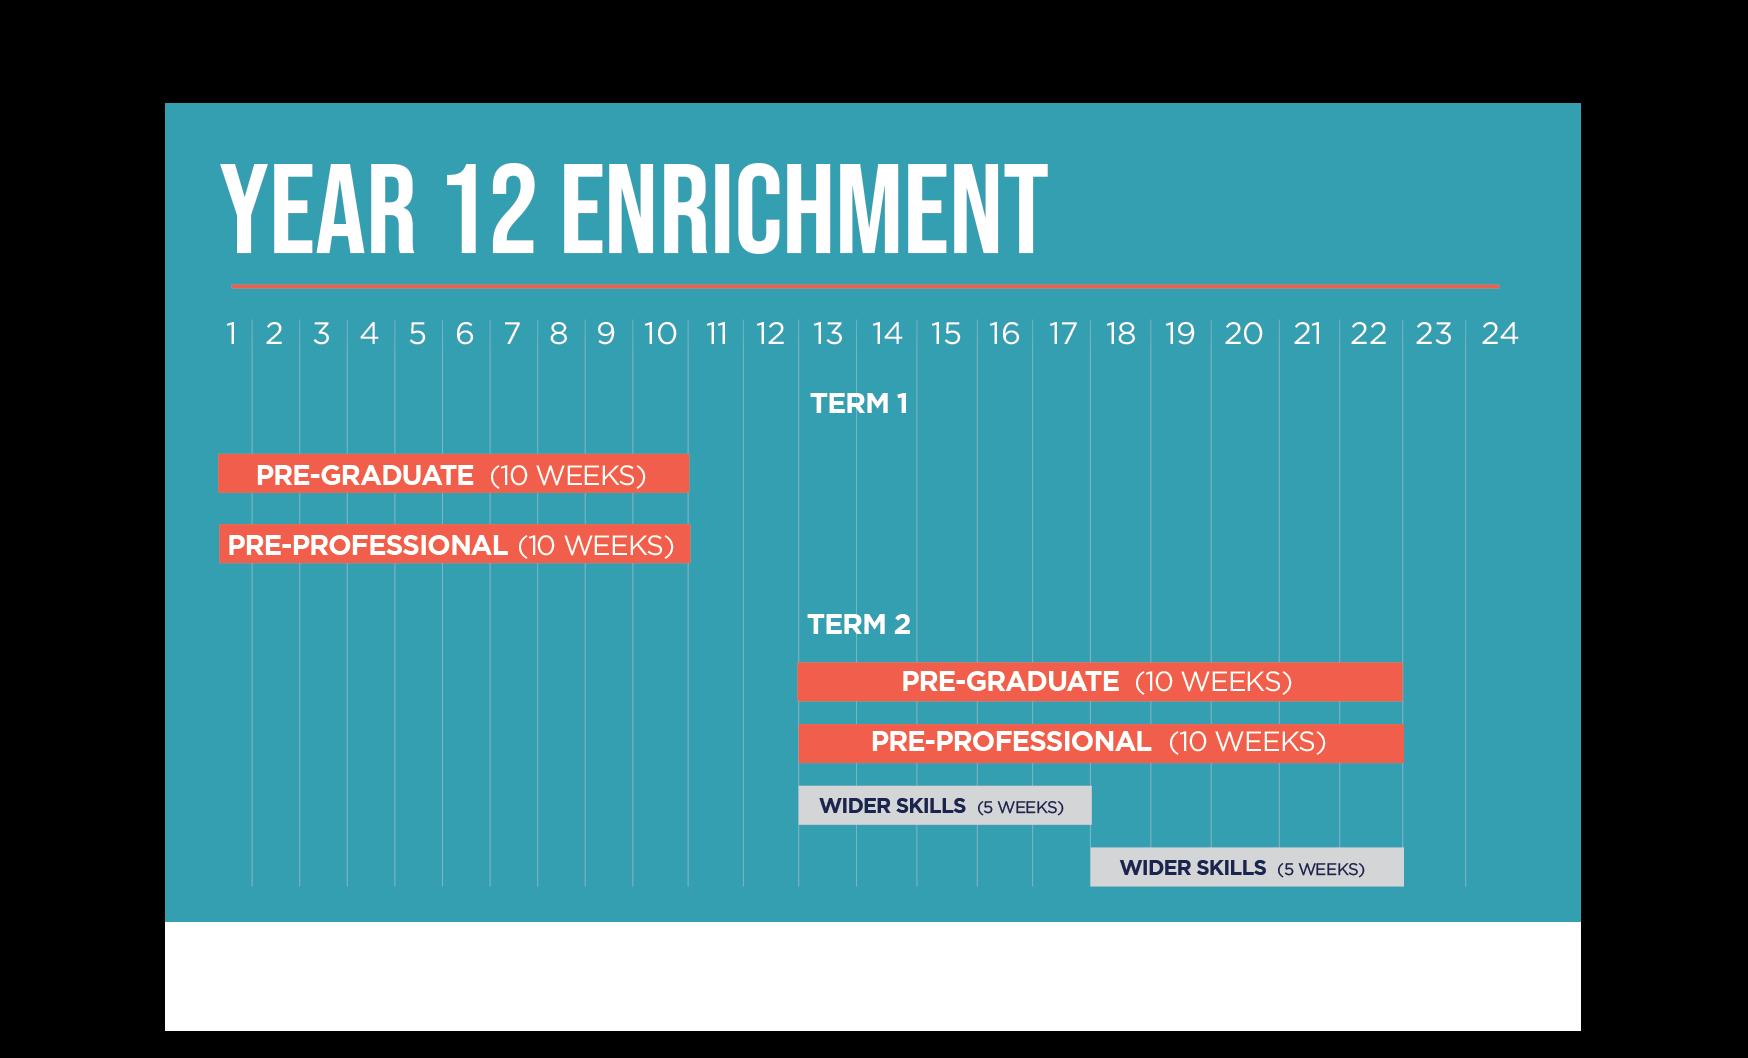 Rsfc yr 12 enrichment table